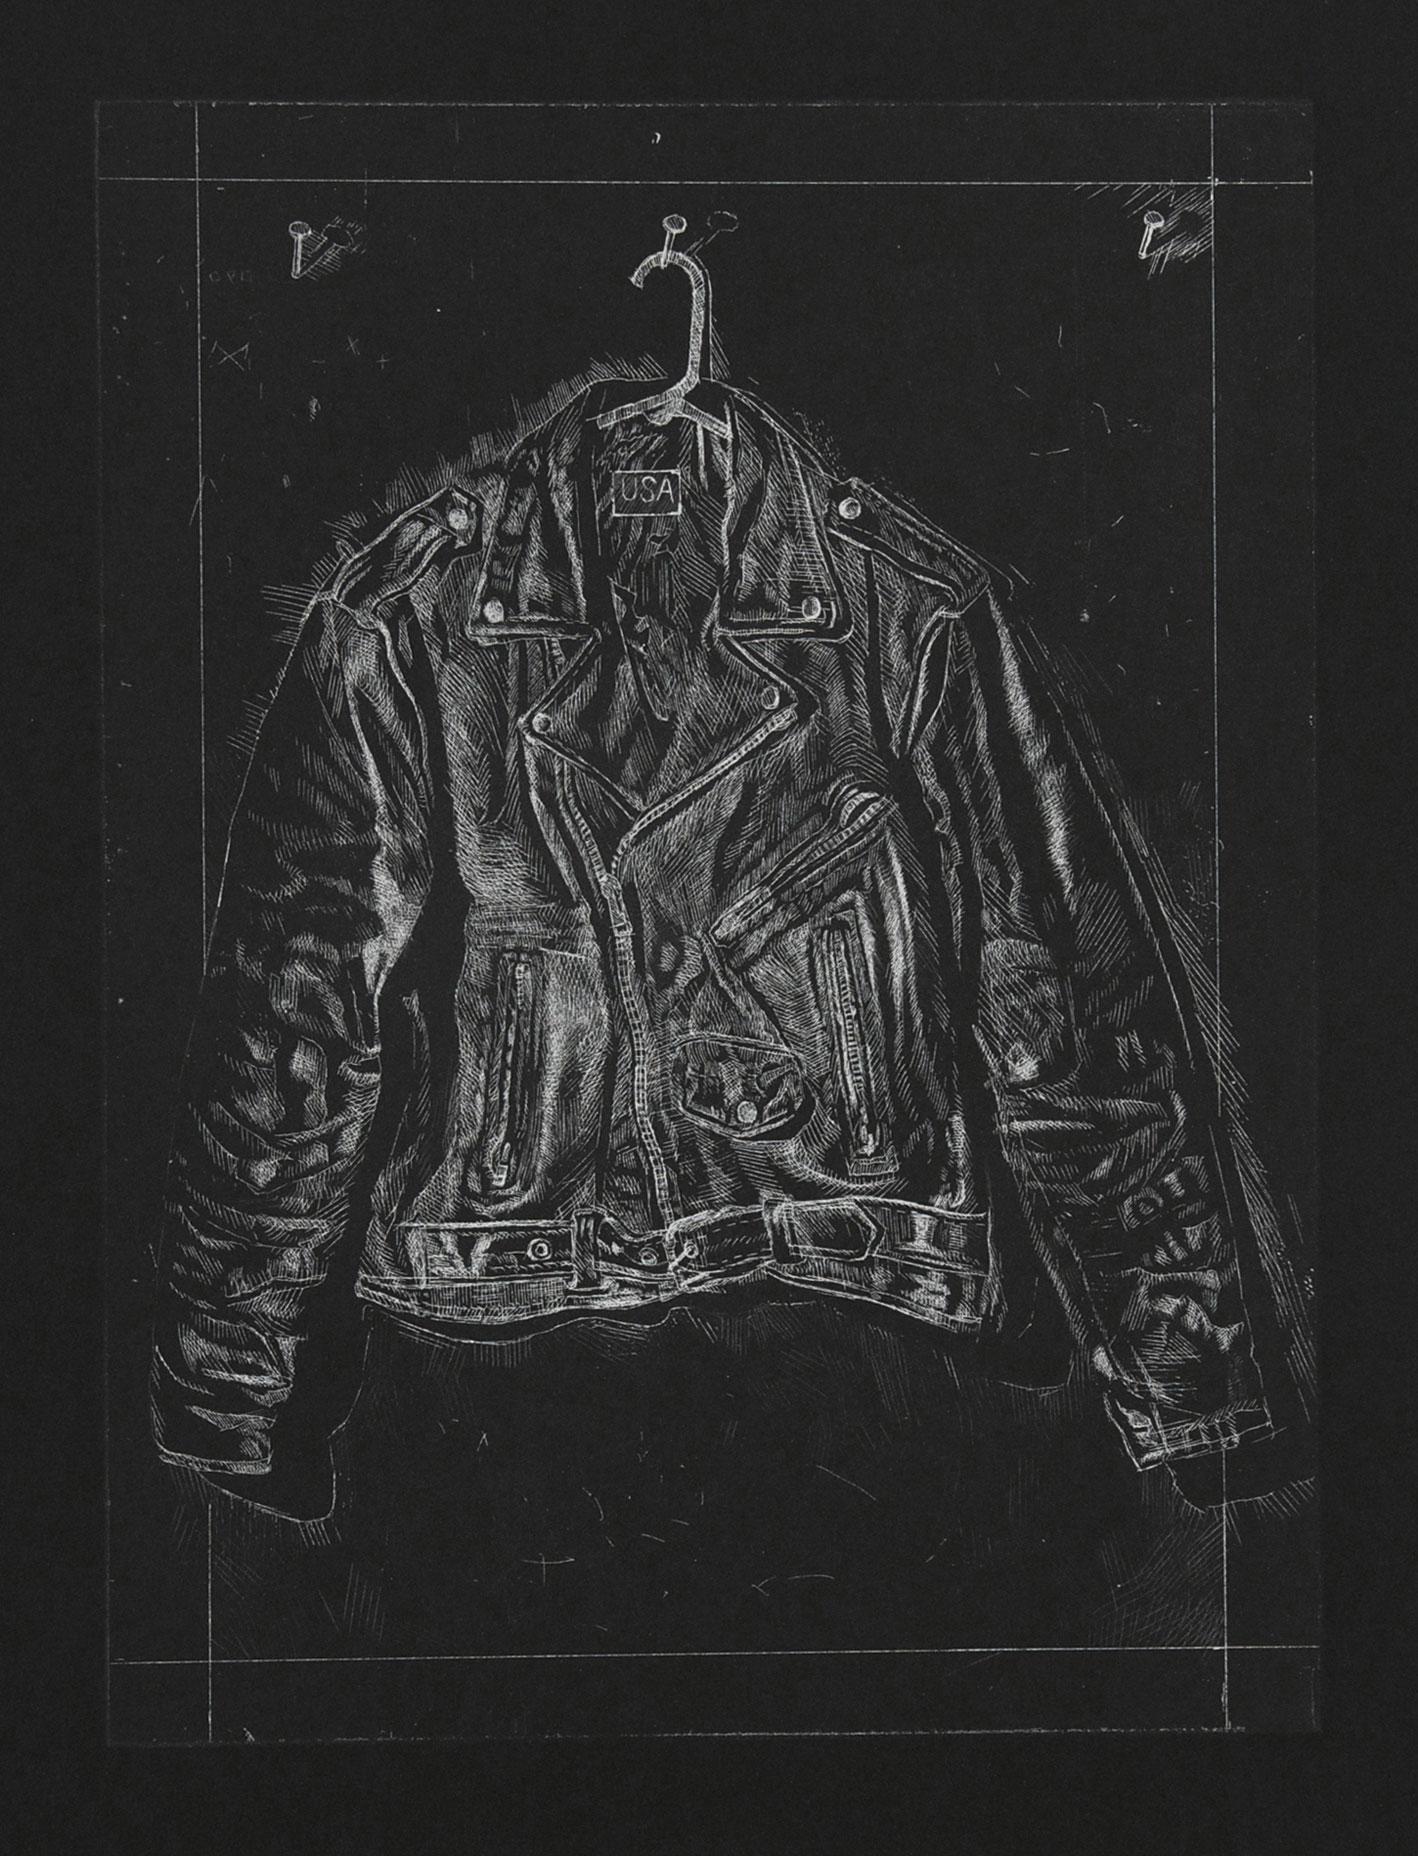 USA Leather 8